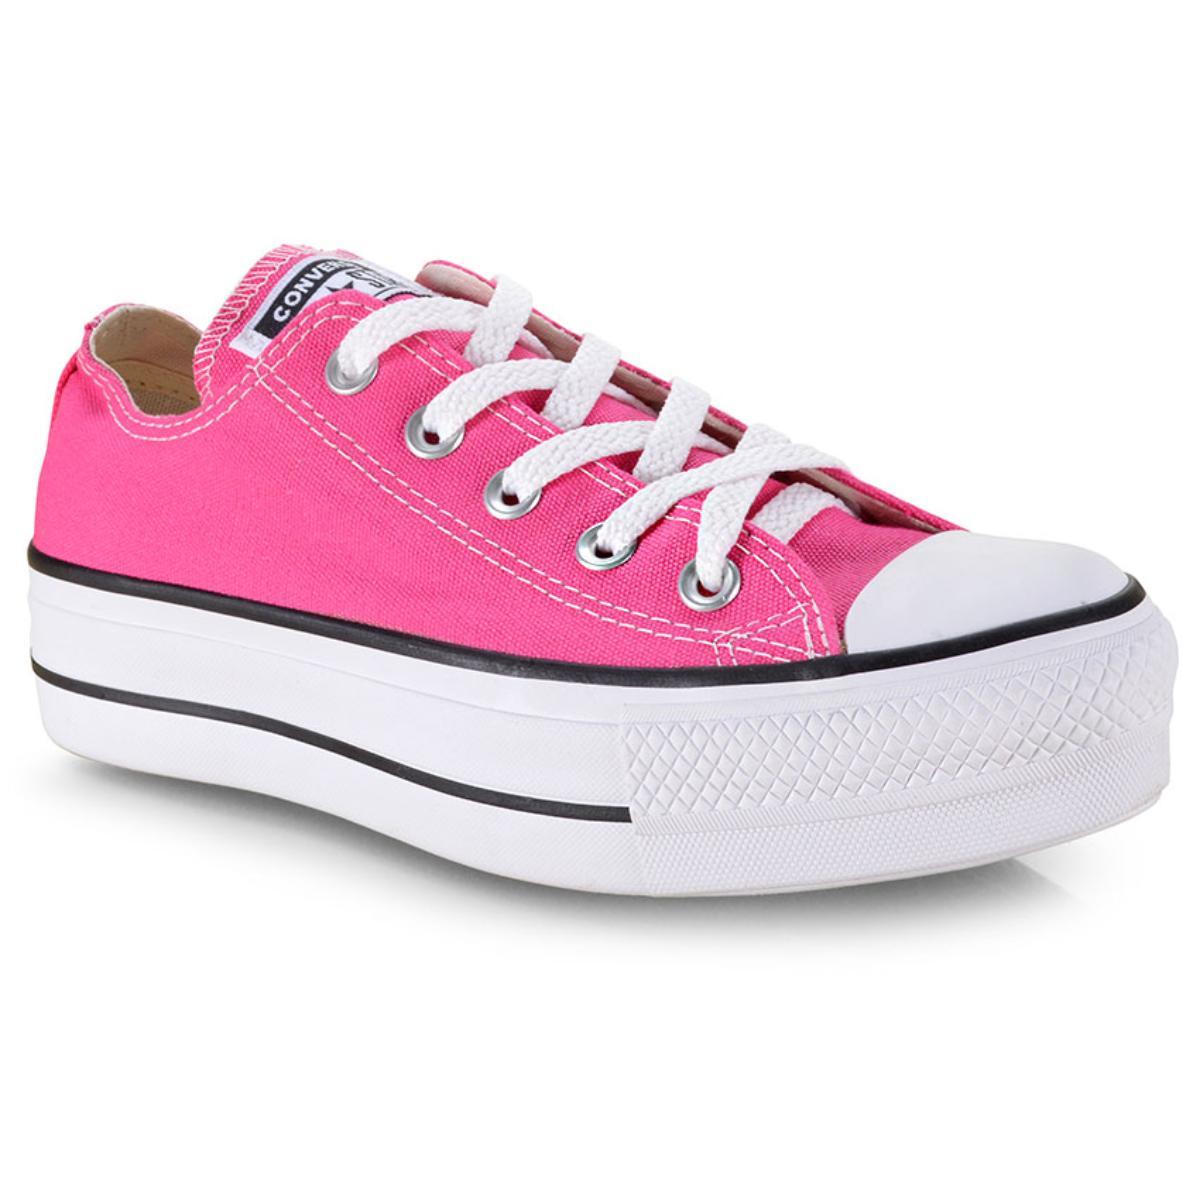 Tênis Feminino All Star Ct09630013 Pink/preto/branco